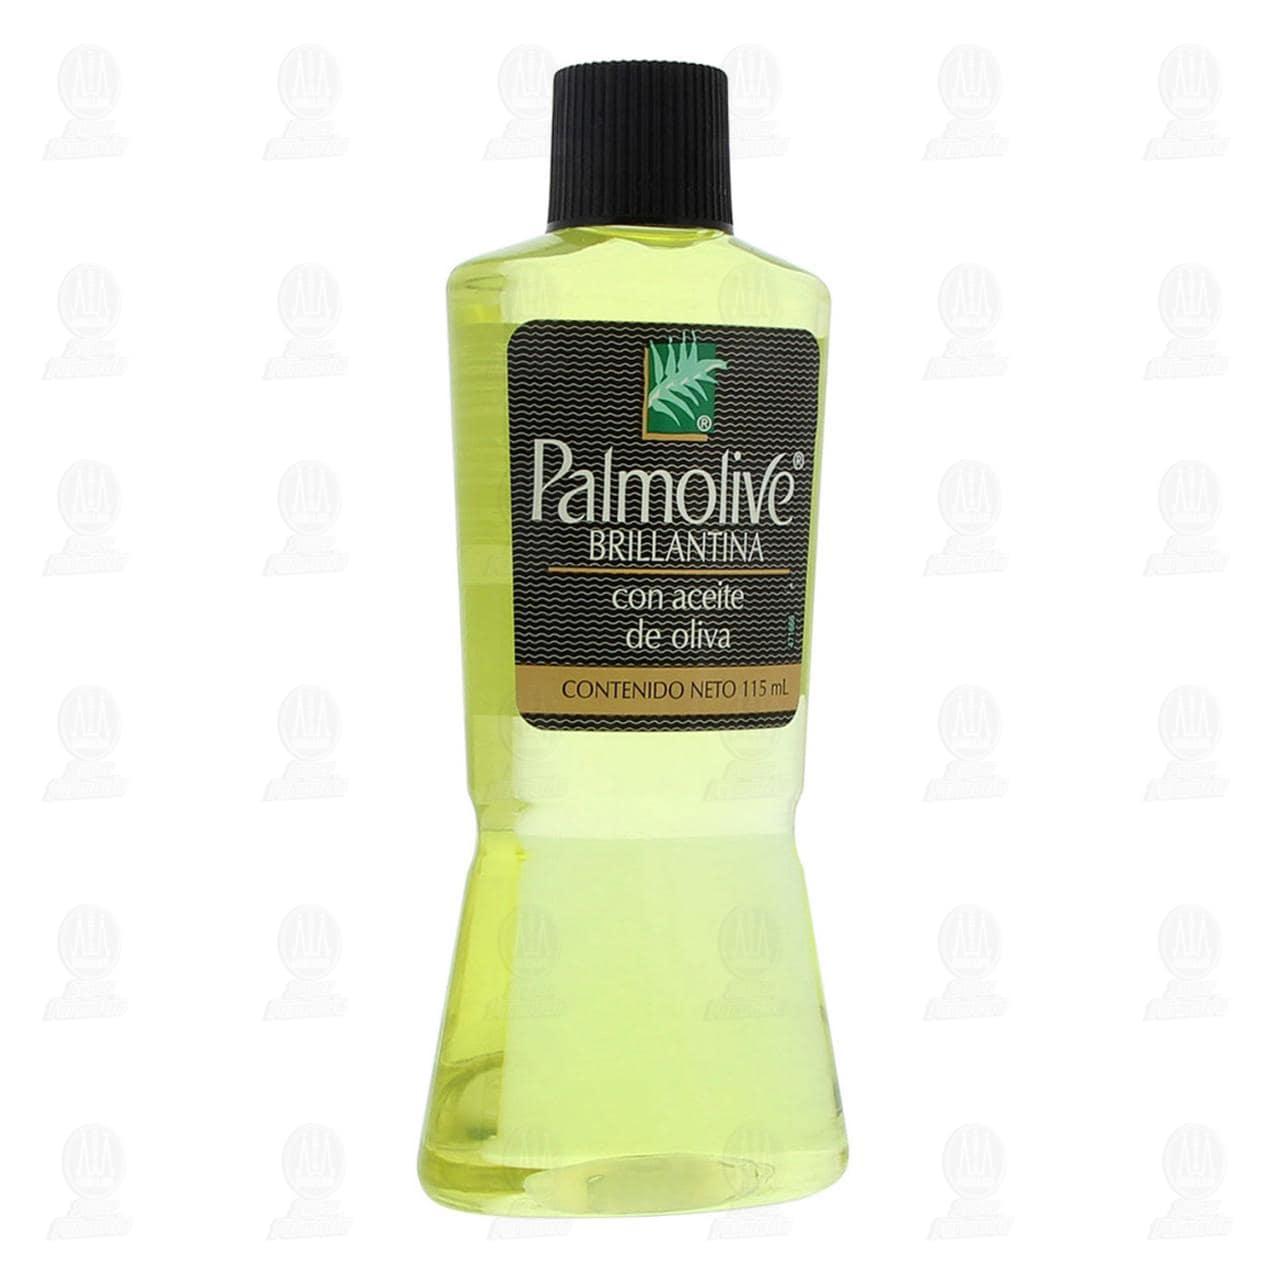 Brillantina Palmolive con Aceite de Oliva, 115 ml.